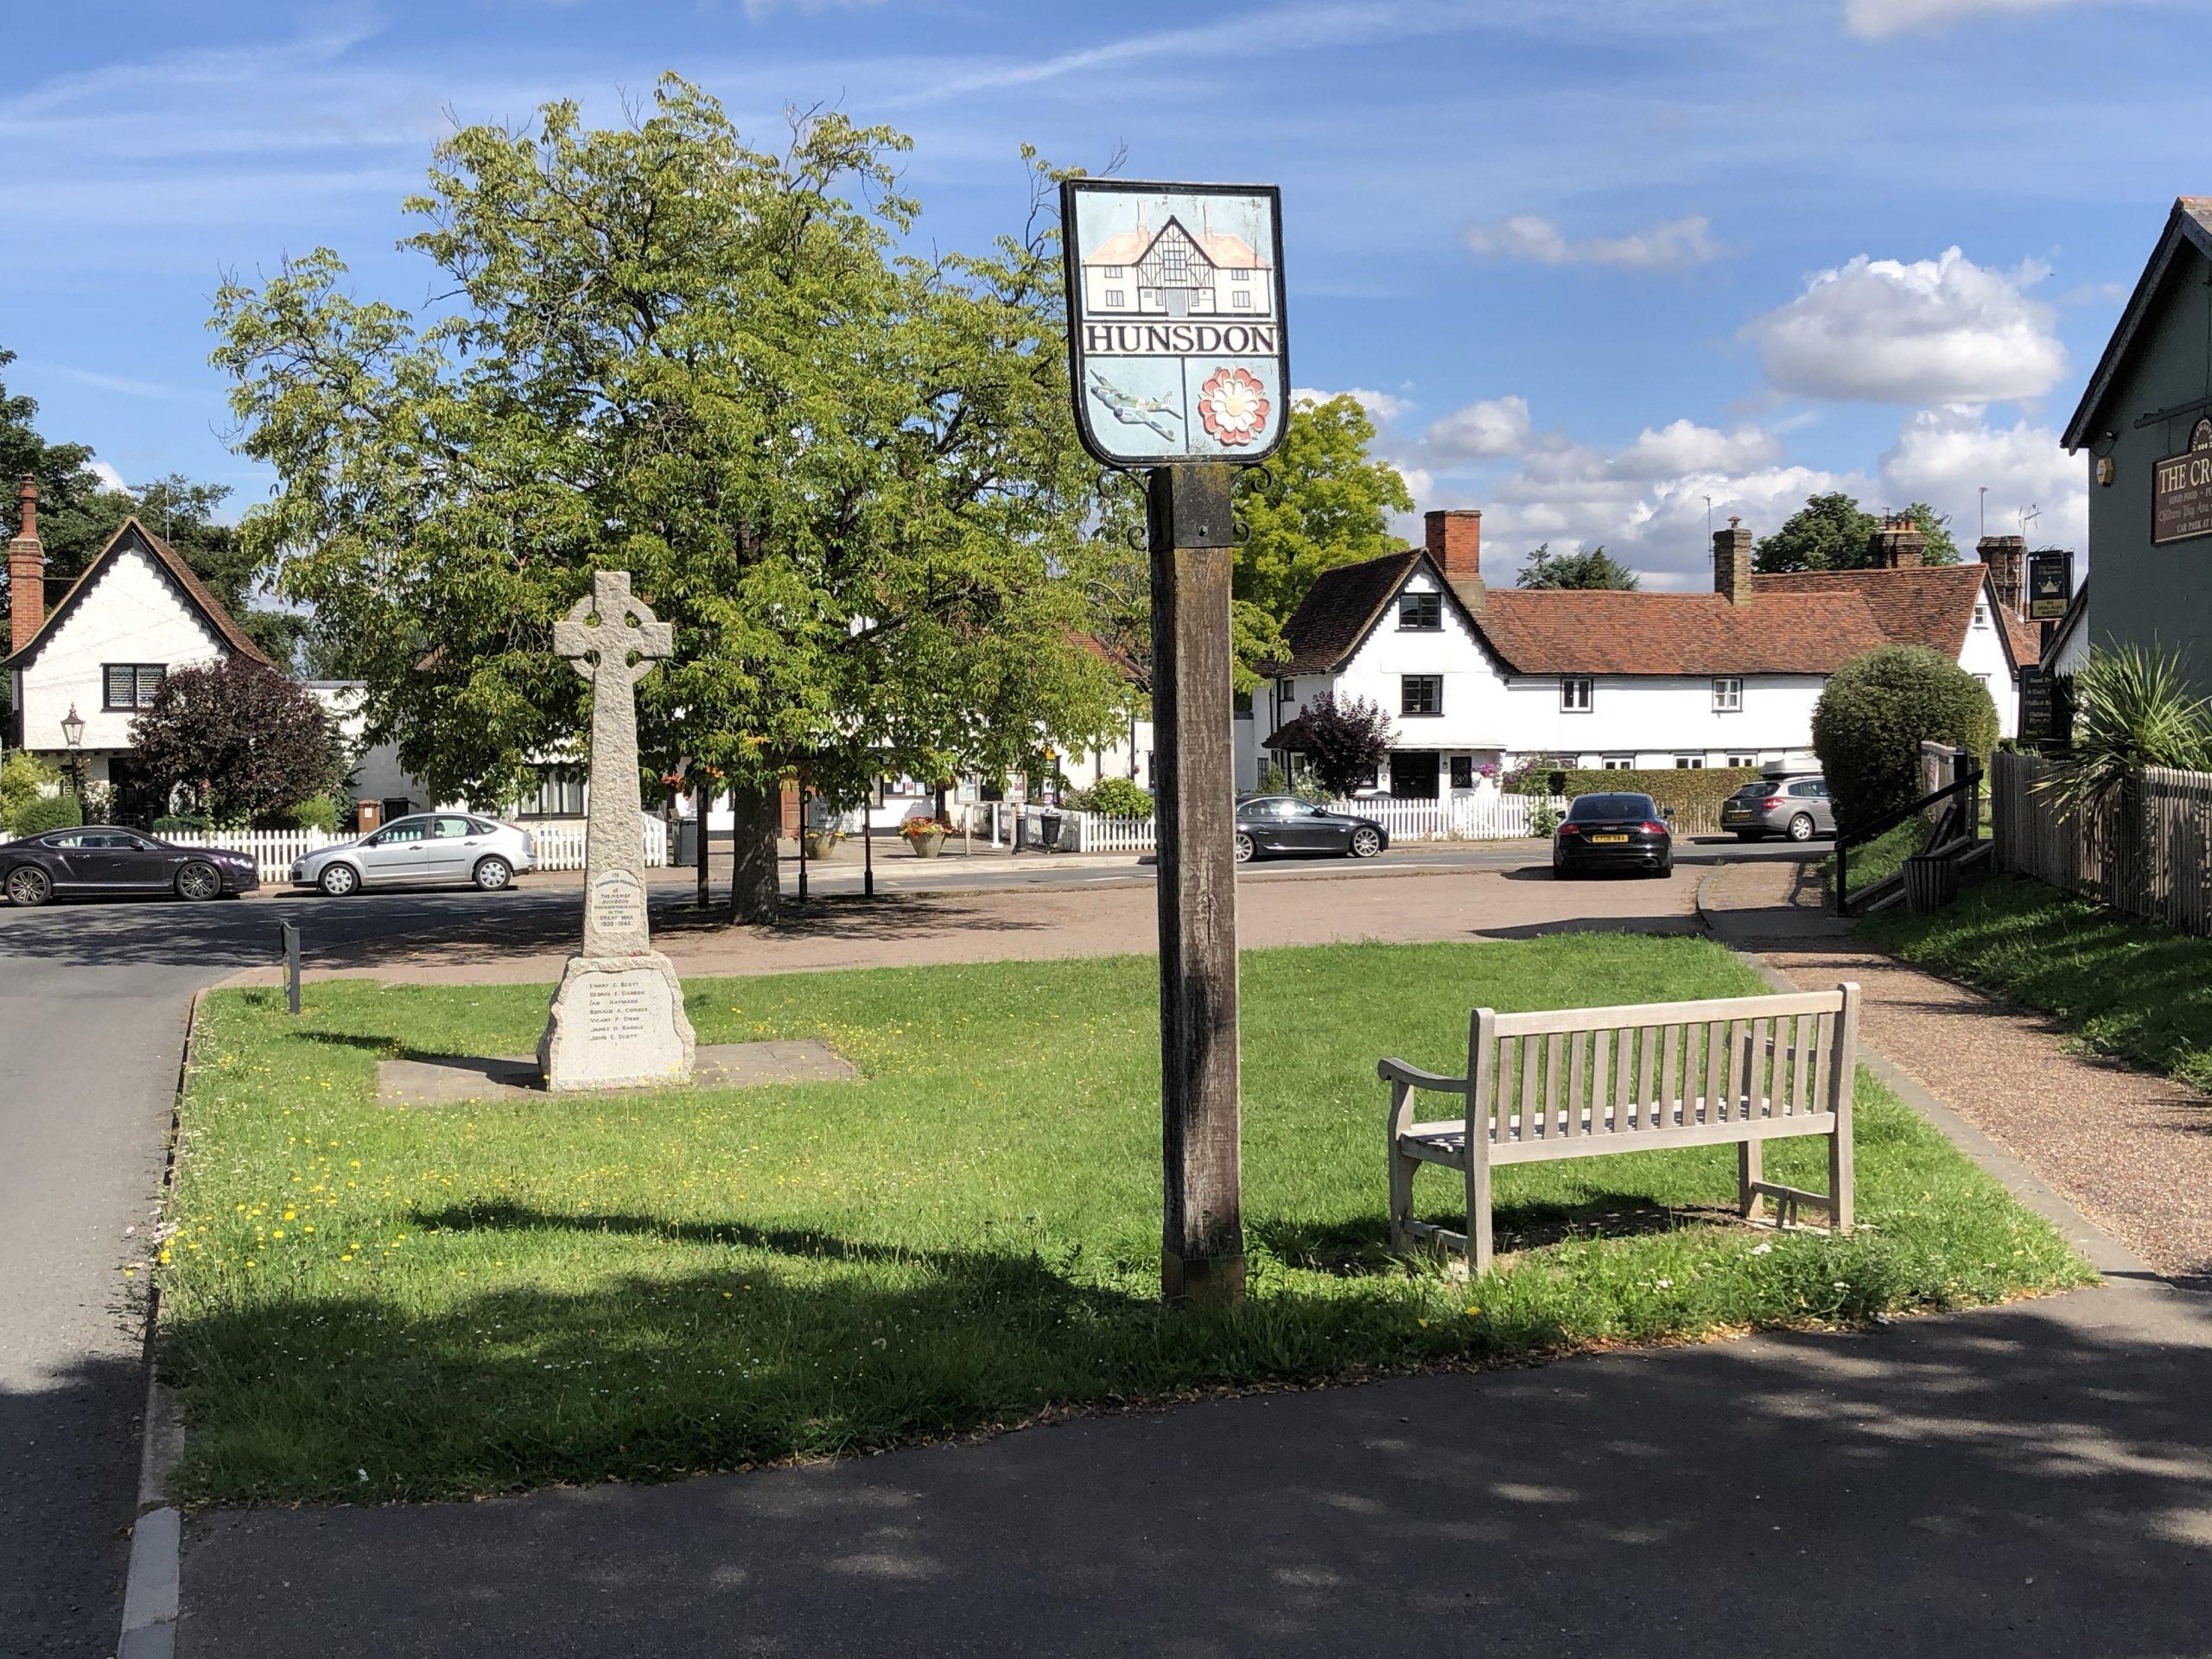 Hunsdon Village